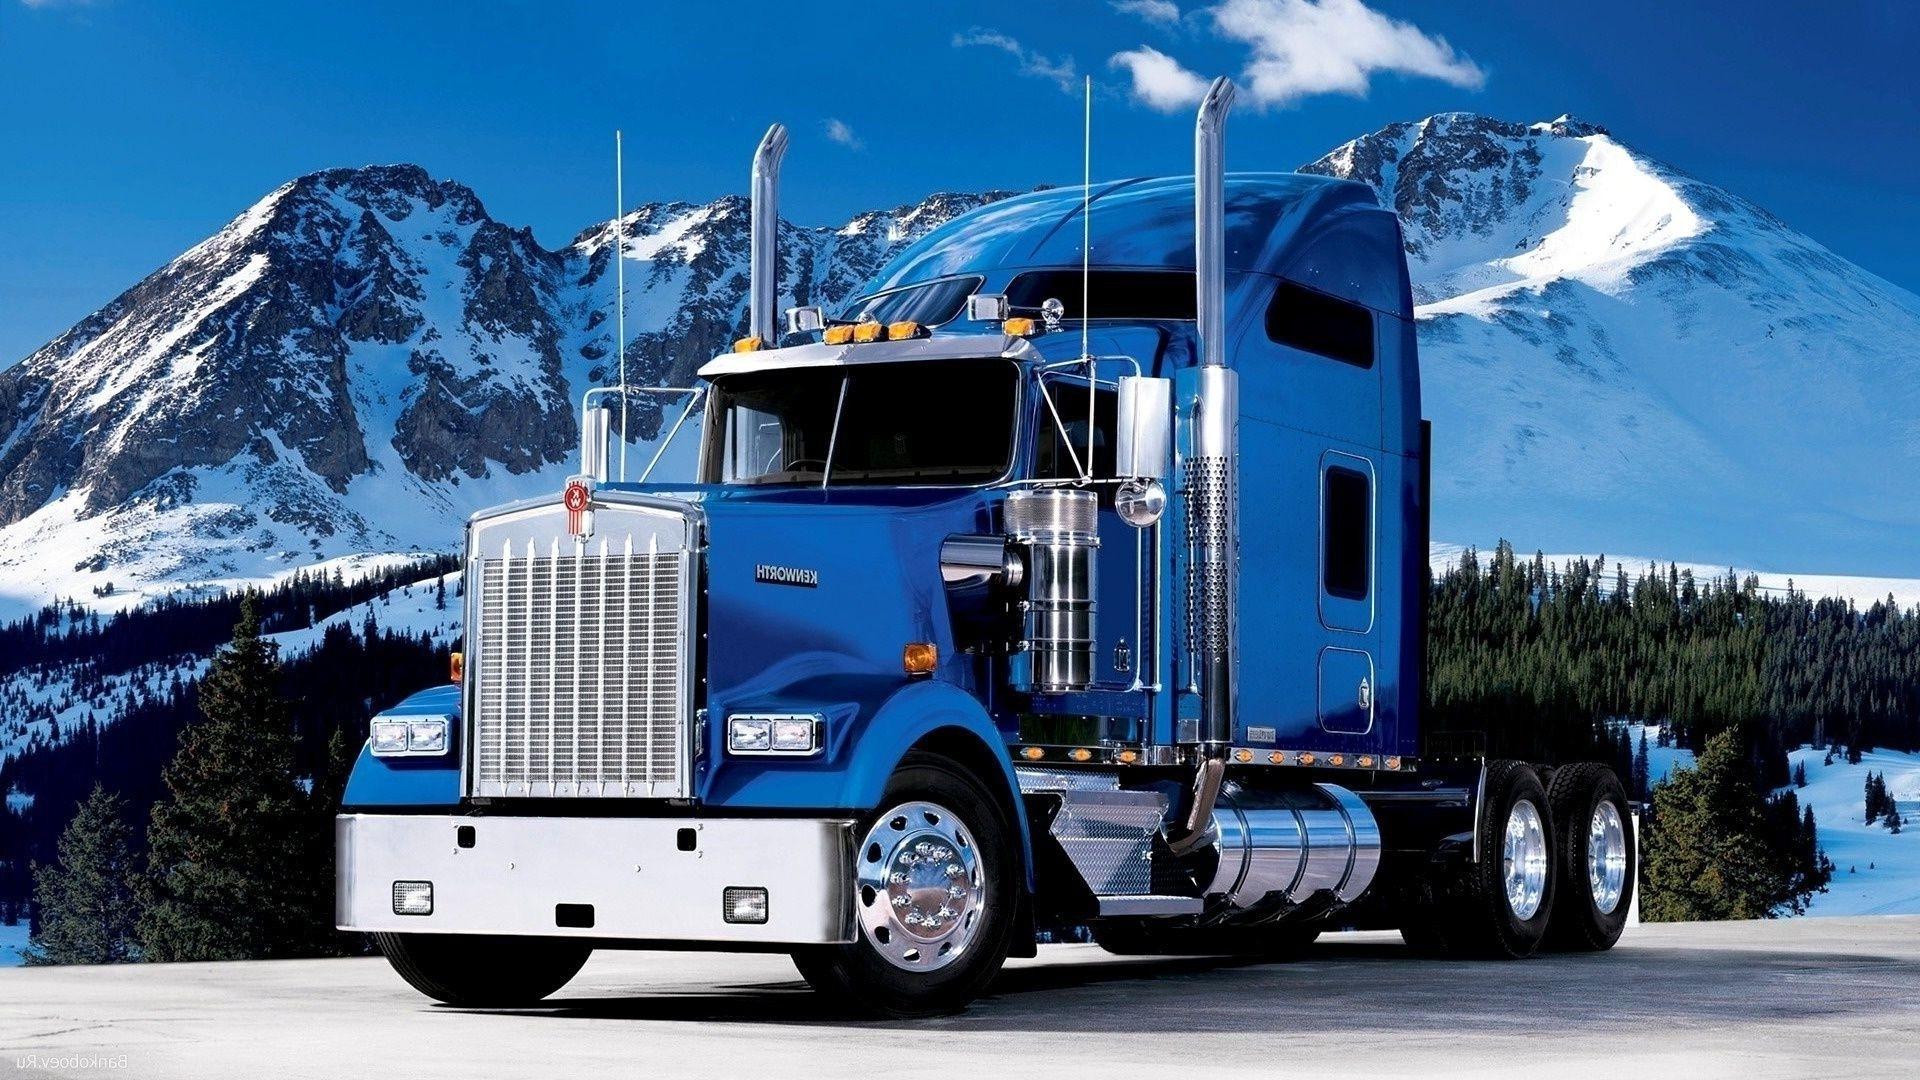 Truck Free Wallpaper